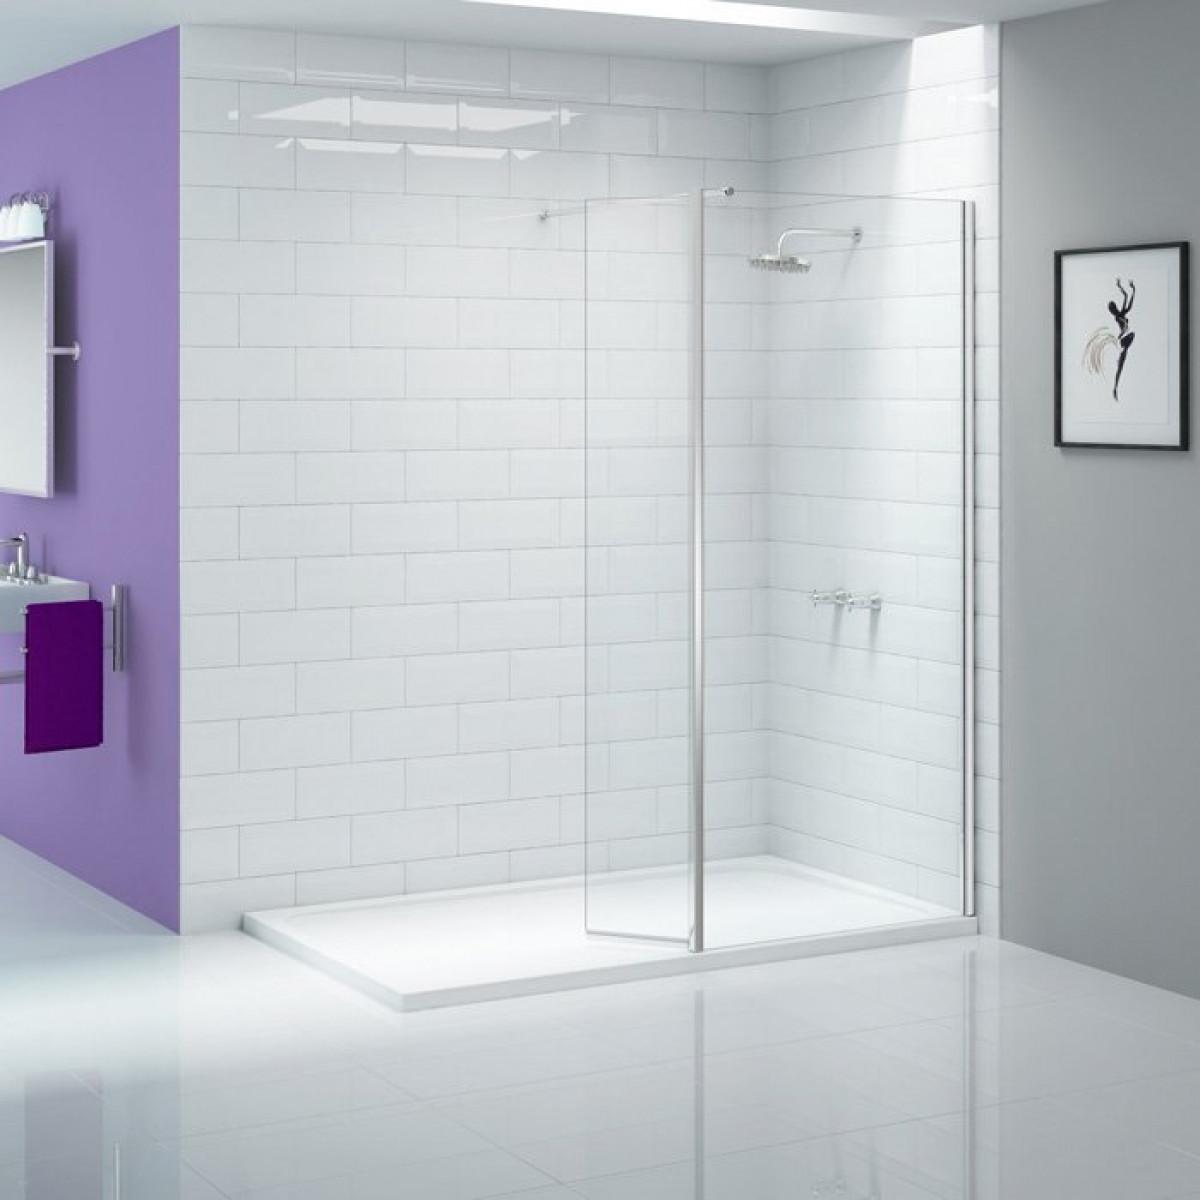 Merlyn Ionic 1000mm Showerwall Panel A0409d0